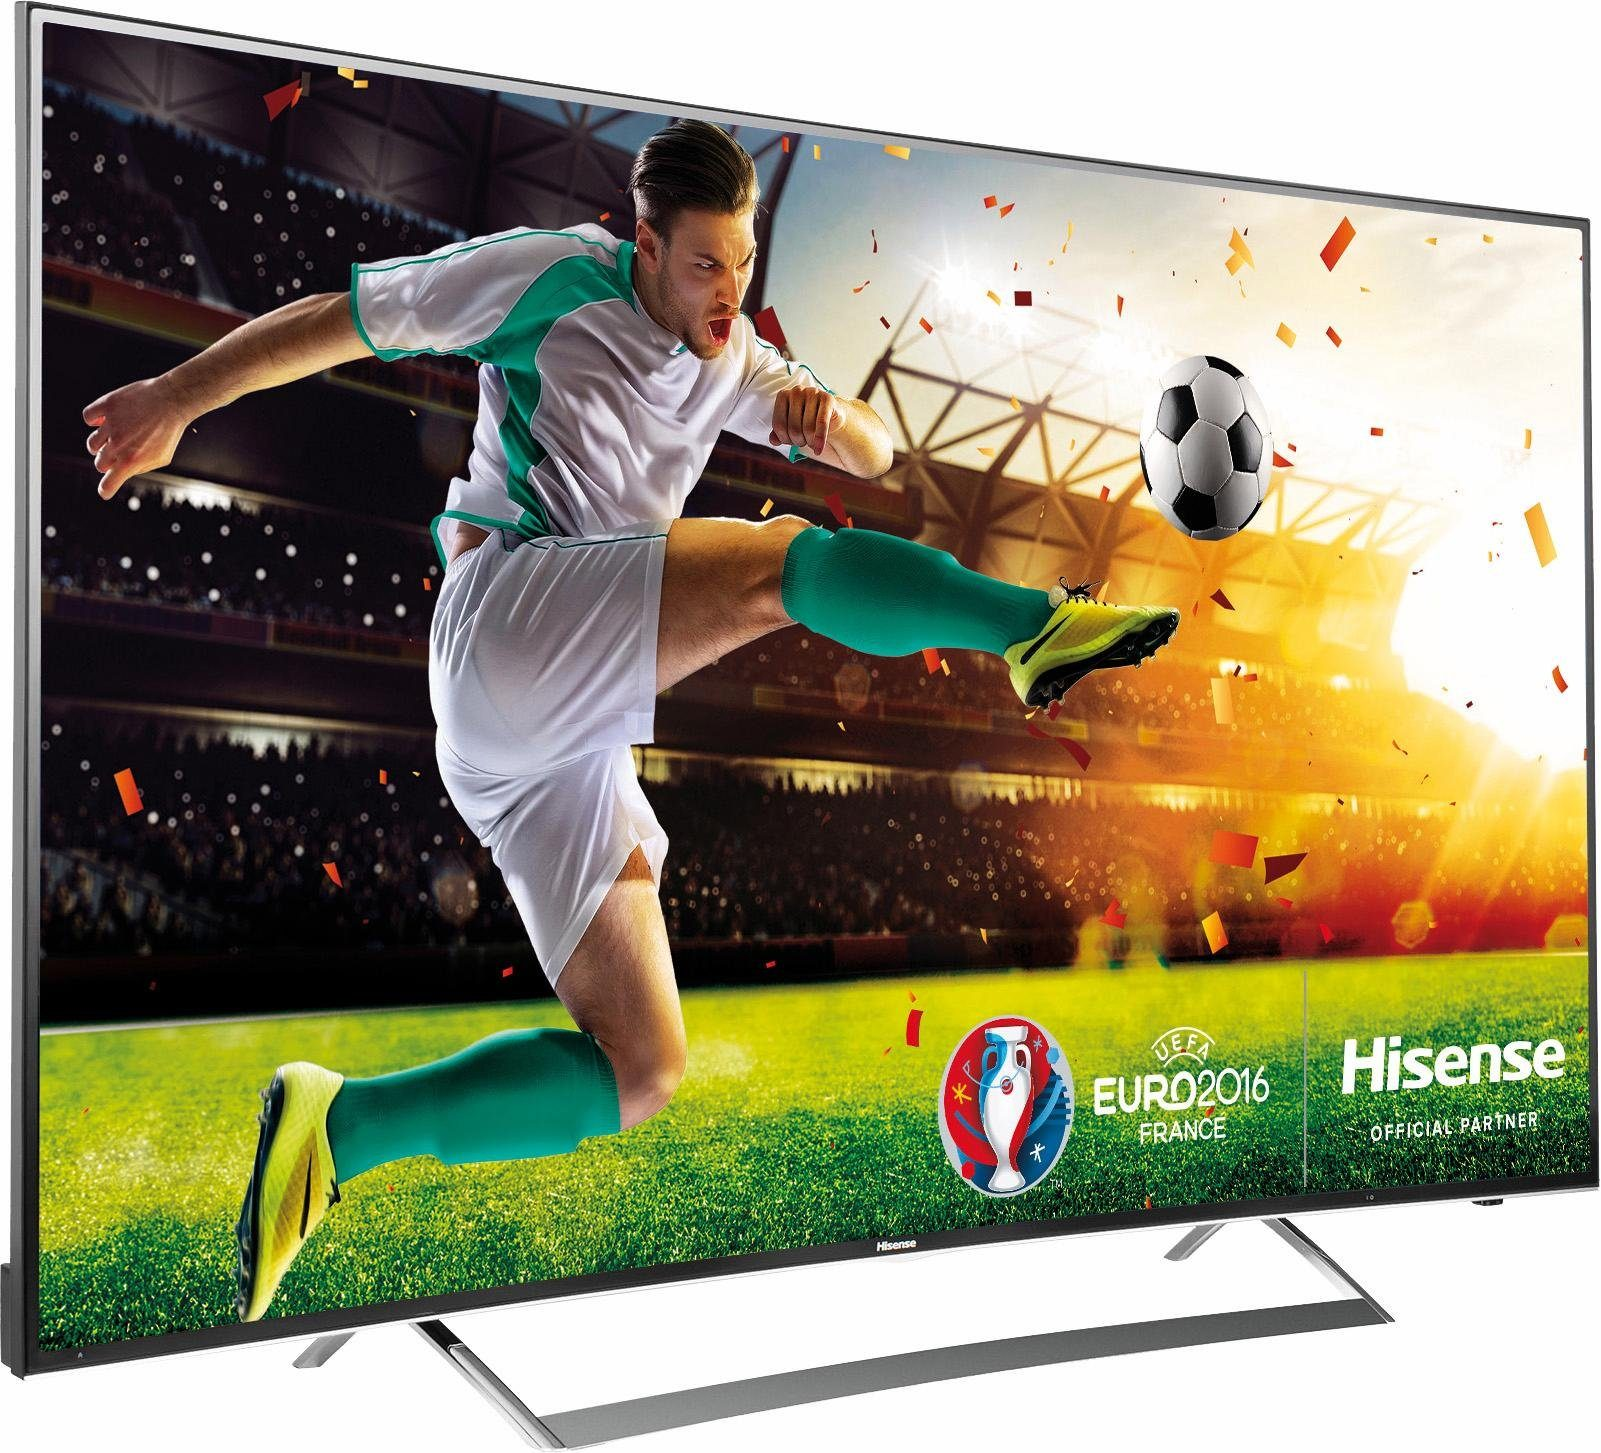 Hisense LTDN65K720, Curved-LED-Fernseher, 163 cm (65 Zoll), 2160p (4K Ultra HD), Smart-TV